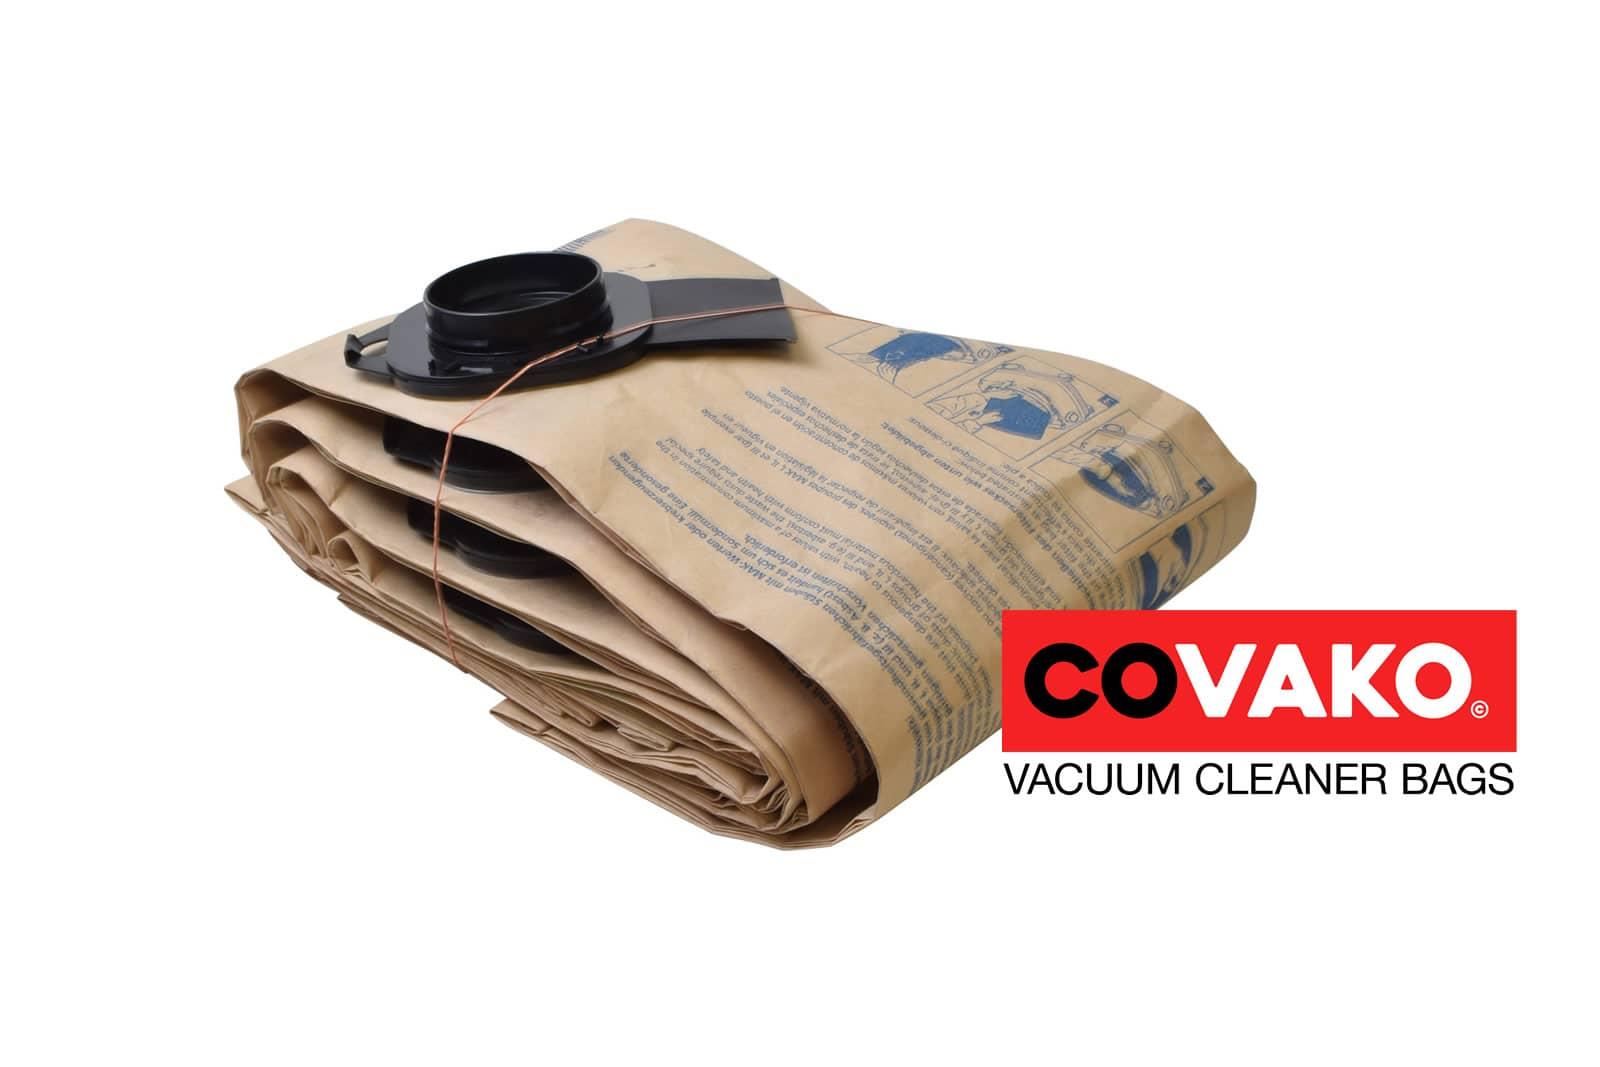 Wap 302001493 / Papier - Wap sacs d'aspirateur